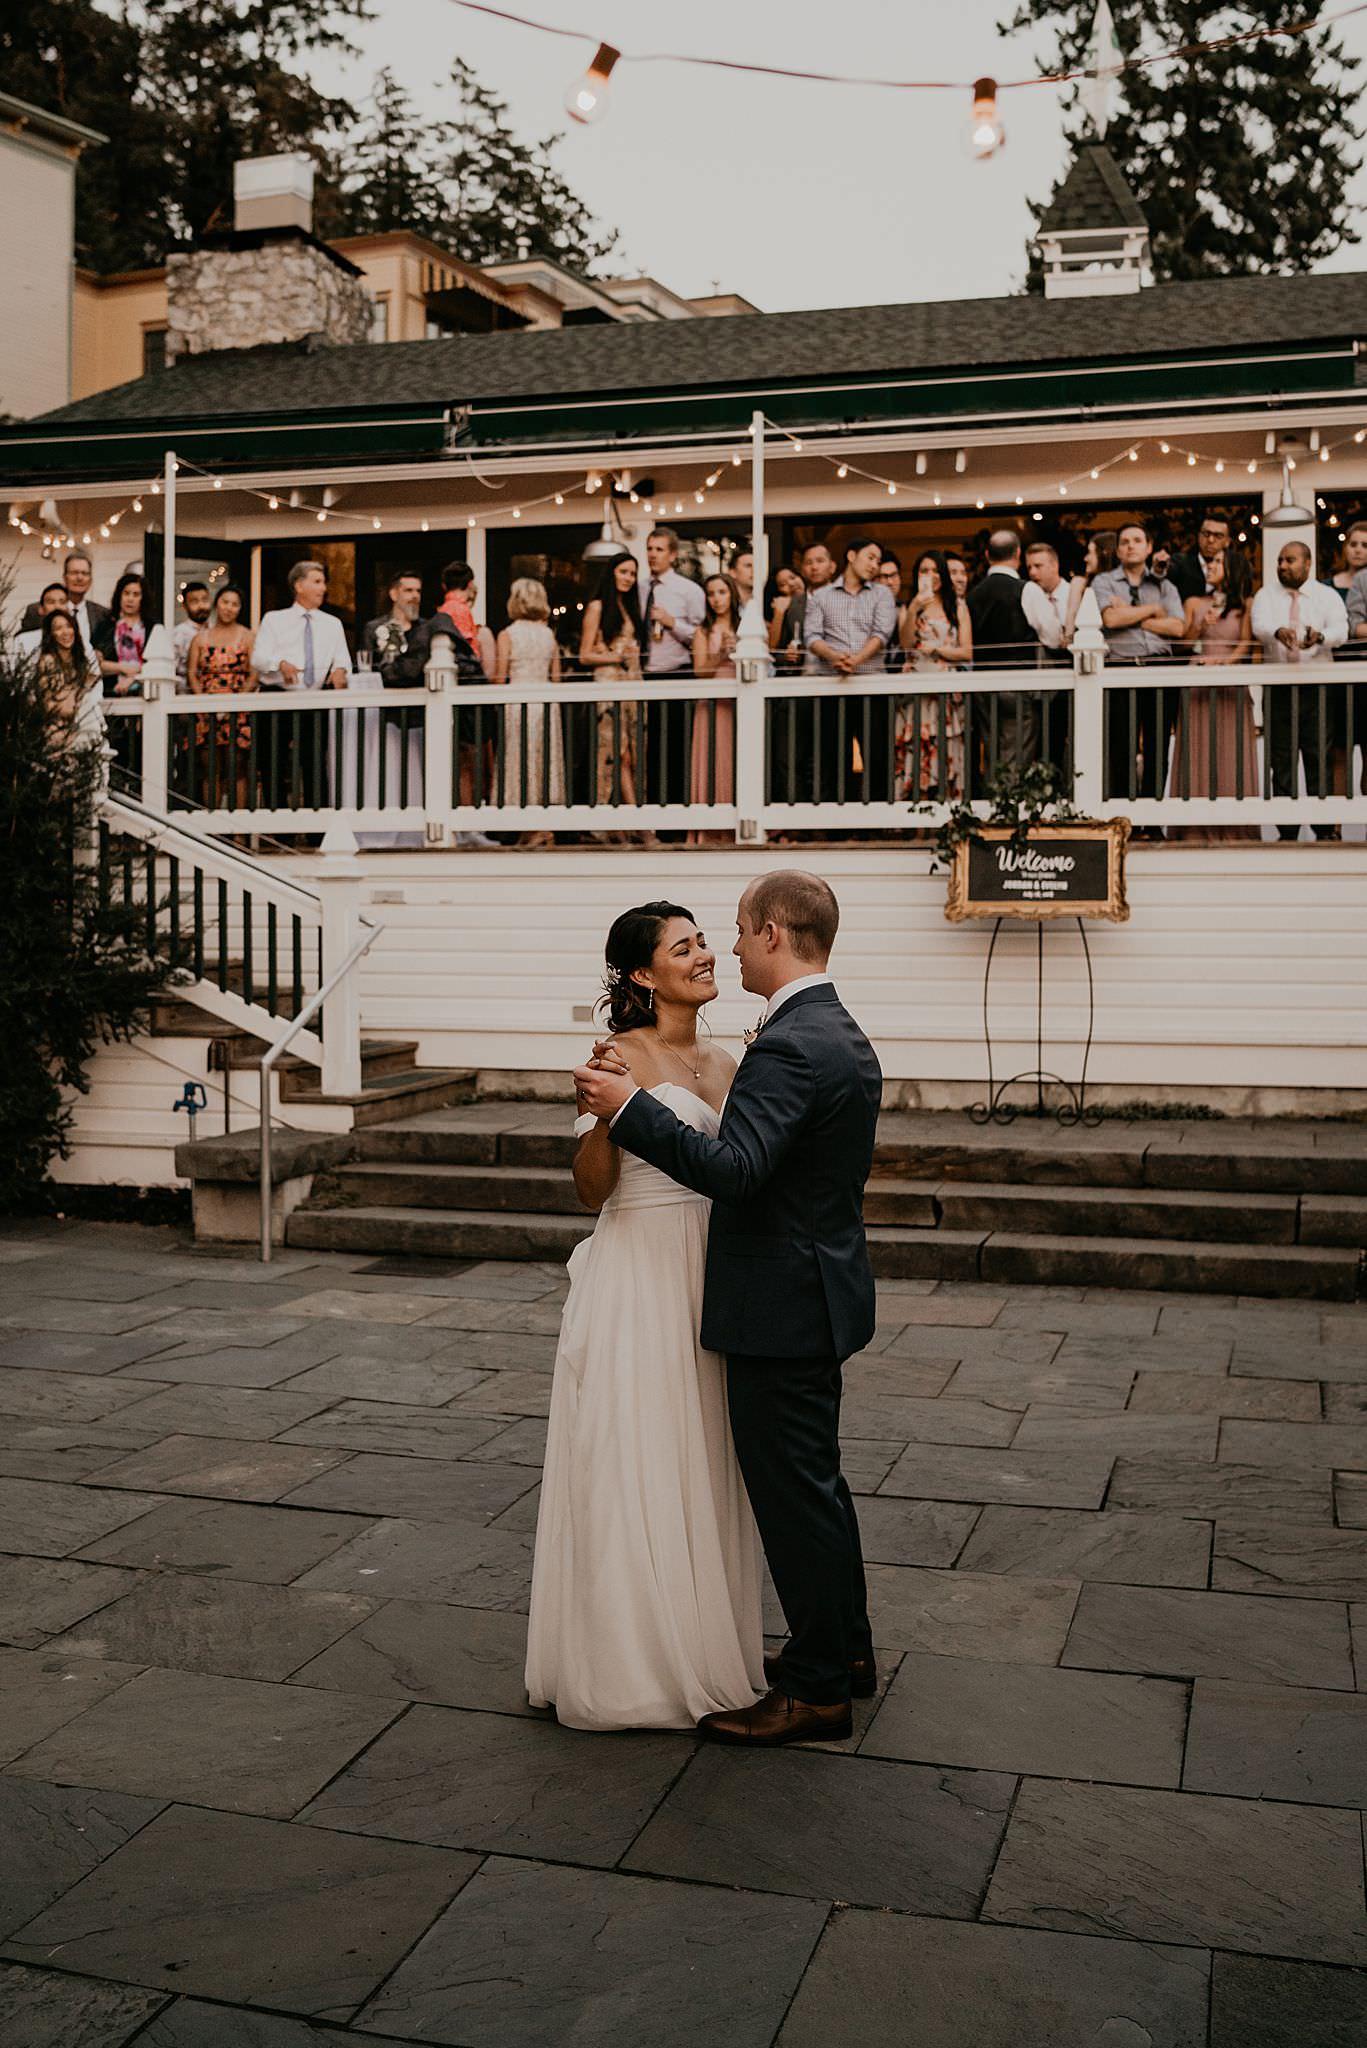 Roche Harbor resort wedding first dance